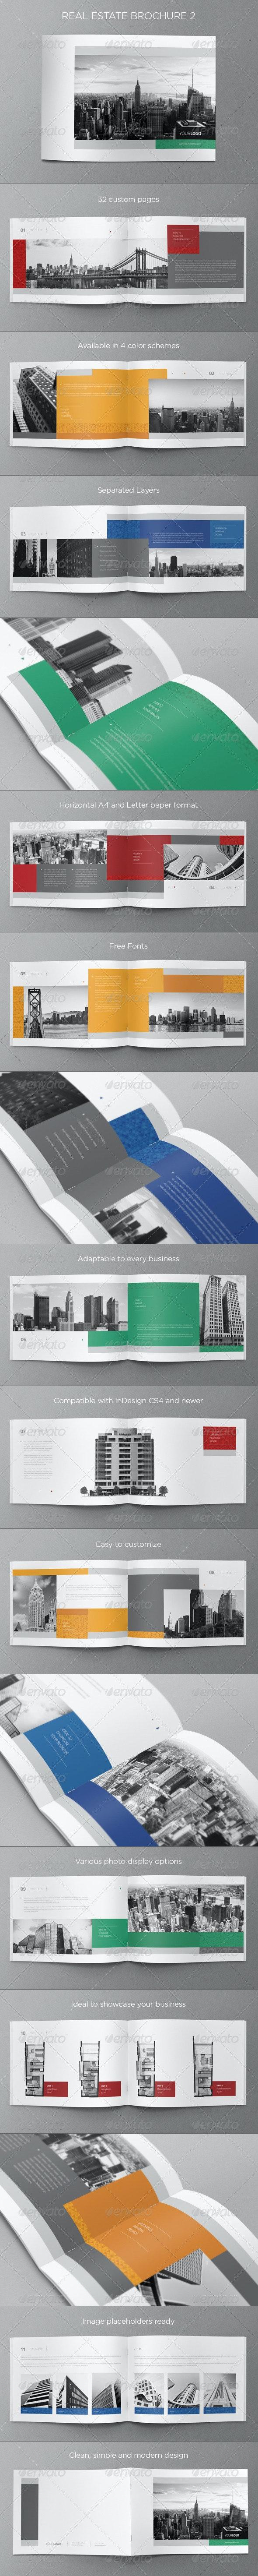 Real Estate Brochure 2 - Brochures Print Templates